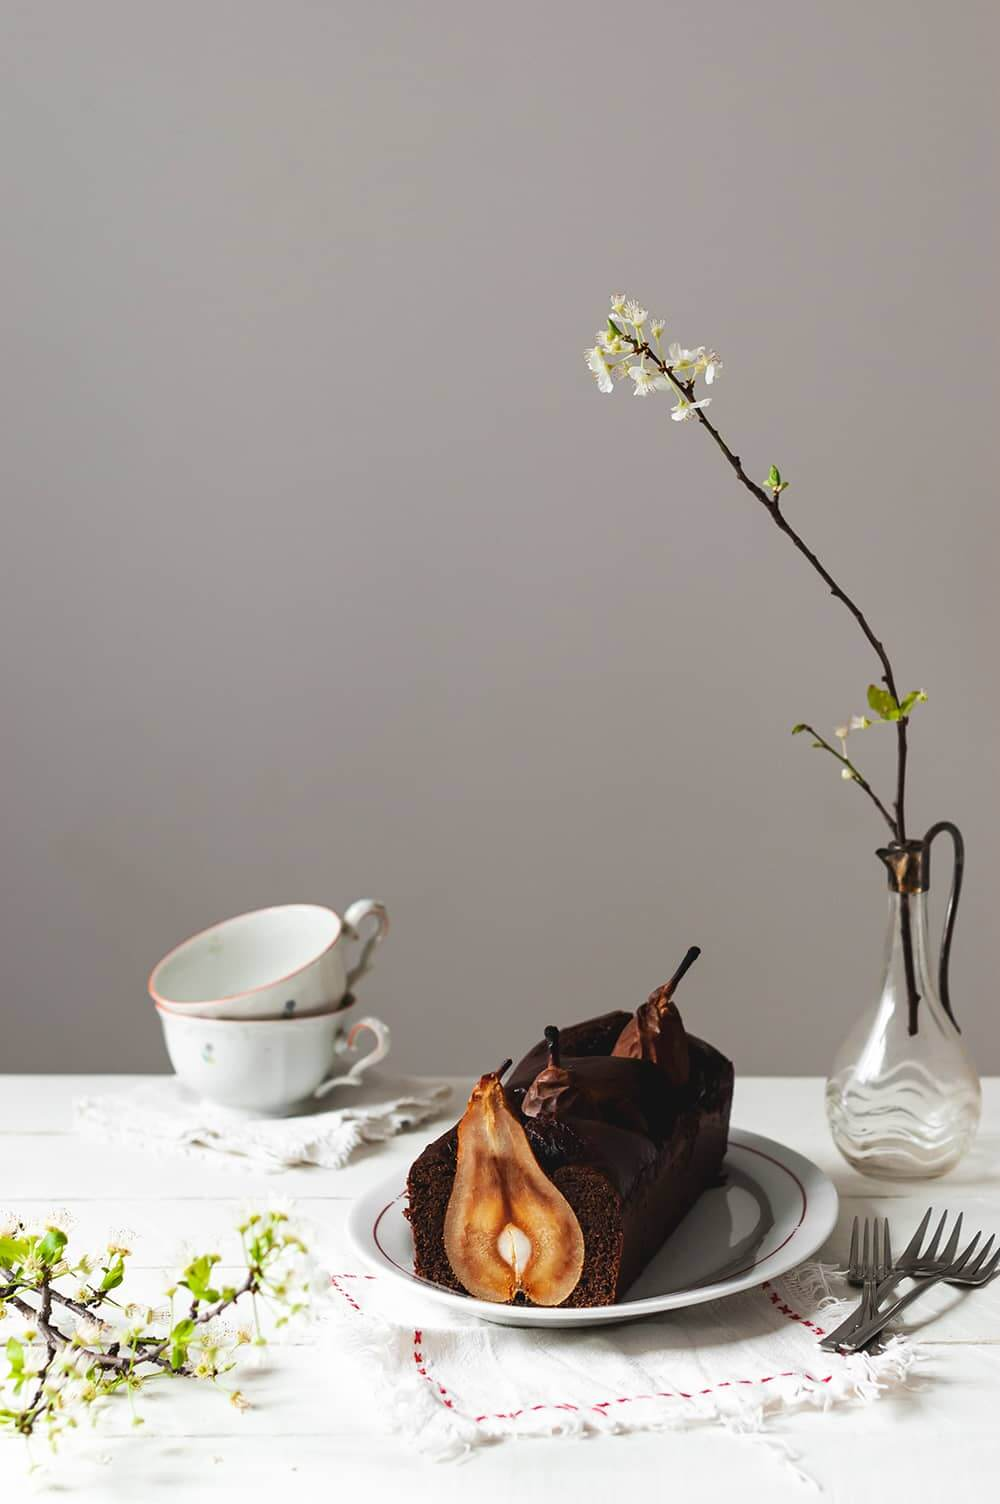 Como hacer plum cake de chocolate con peras enteras